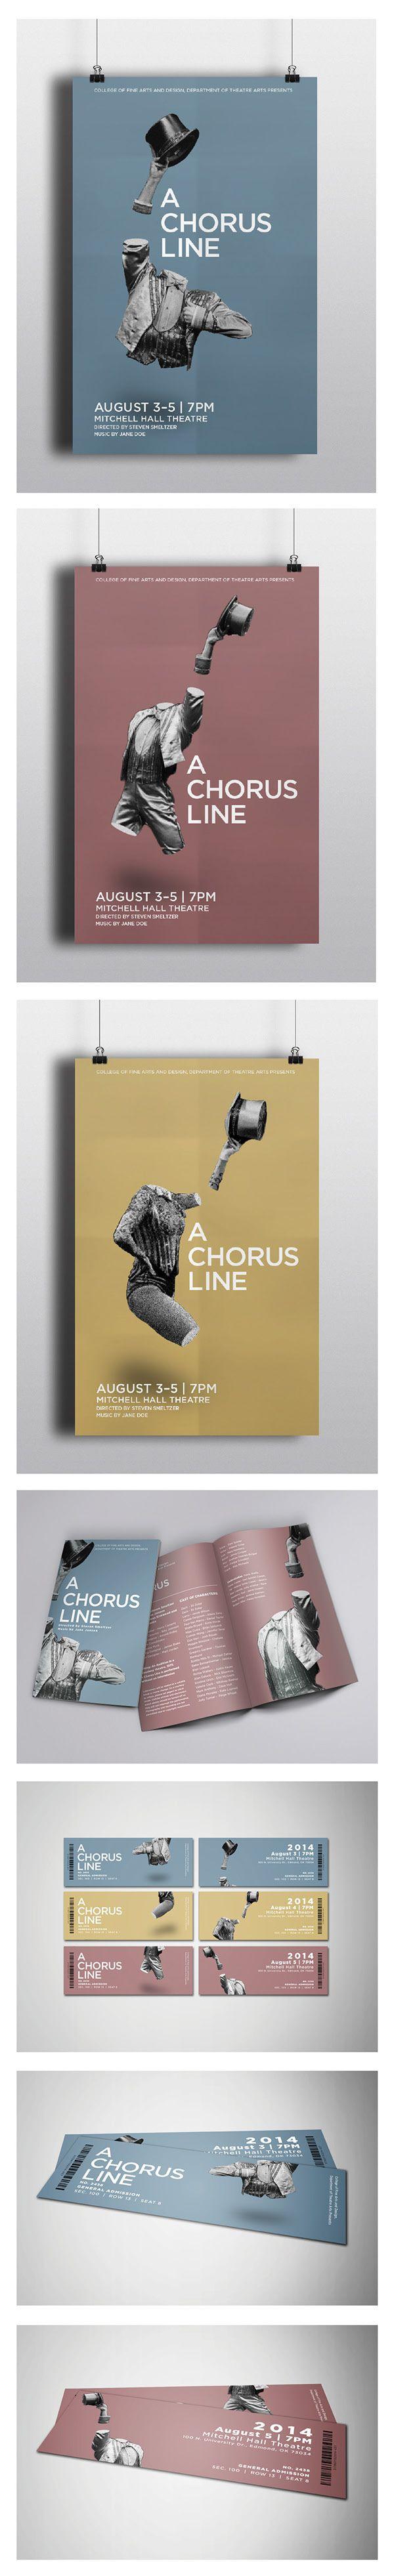 A Chorus Line on Behance